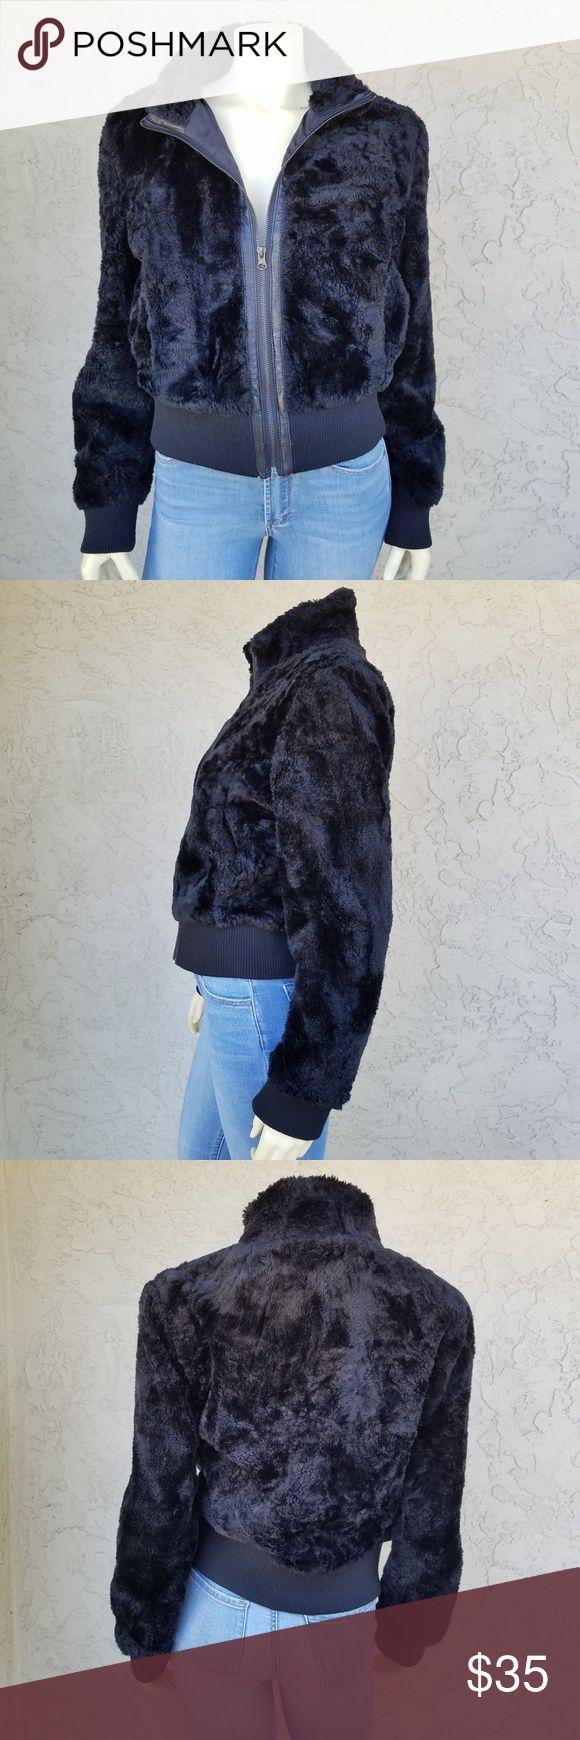 Coffee Shop Black Faux Fur Full Zip Bomber Jacket Black